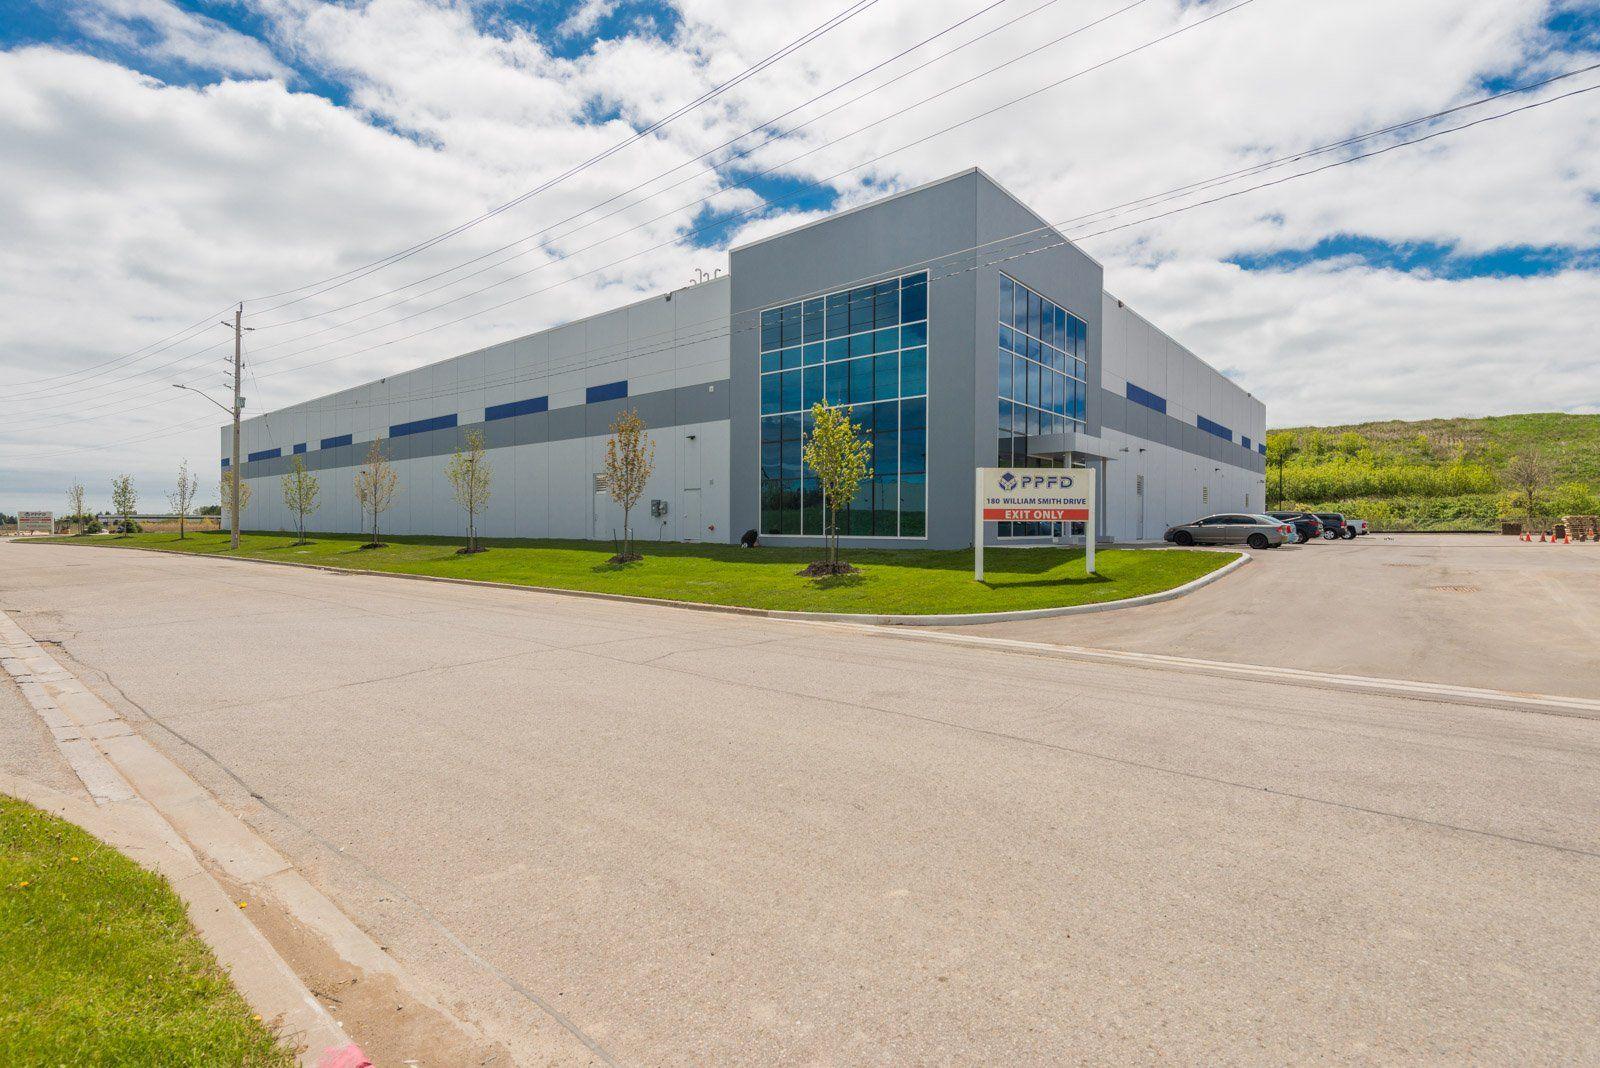 PPFD New Facility - Whitby, Ontario